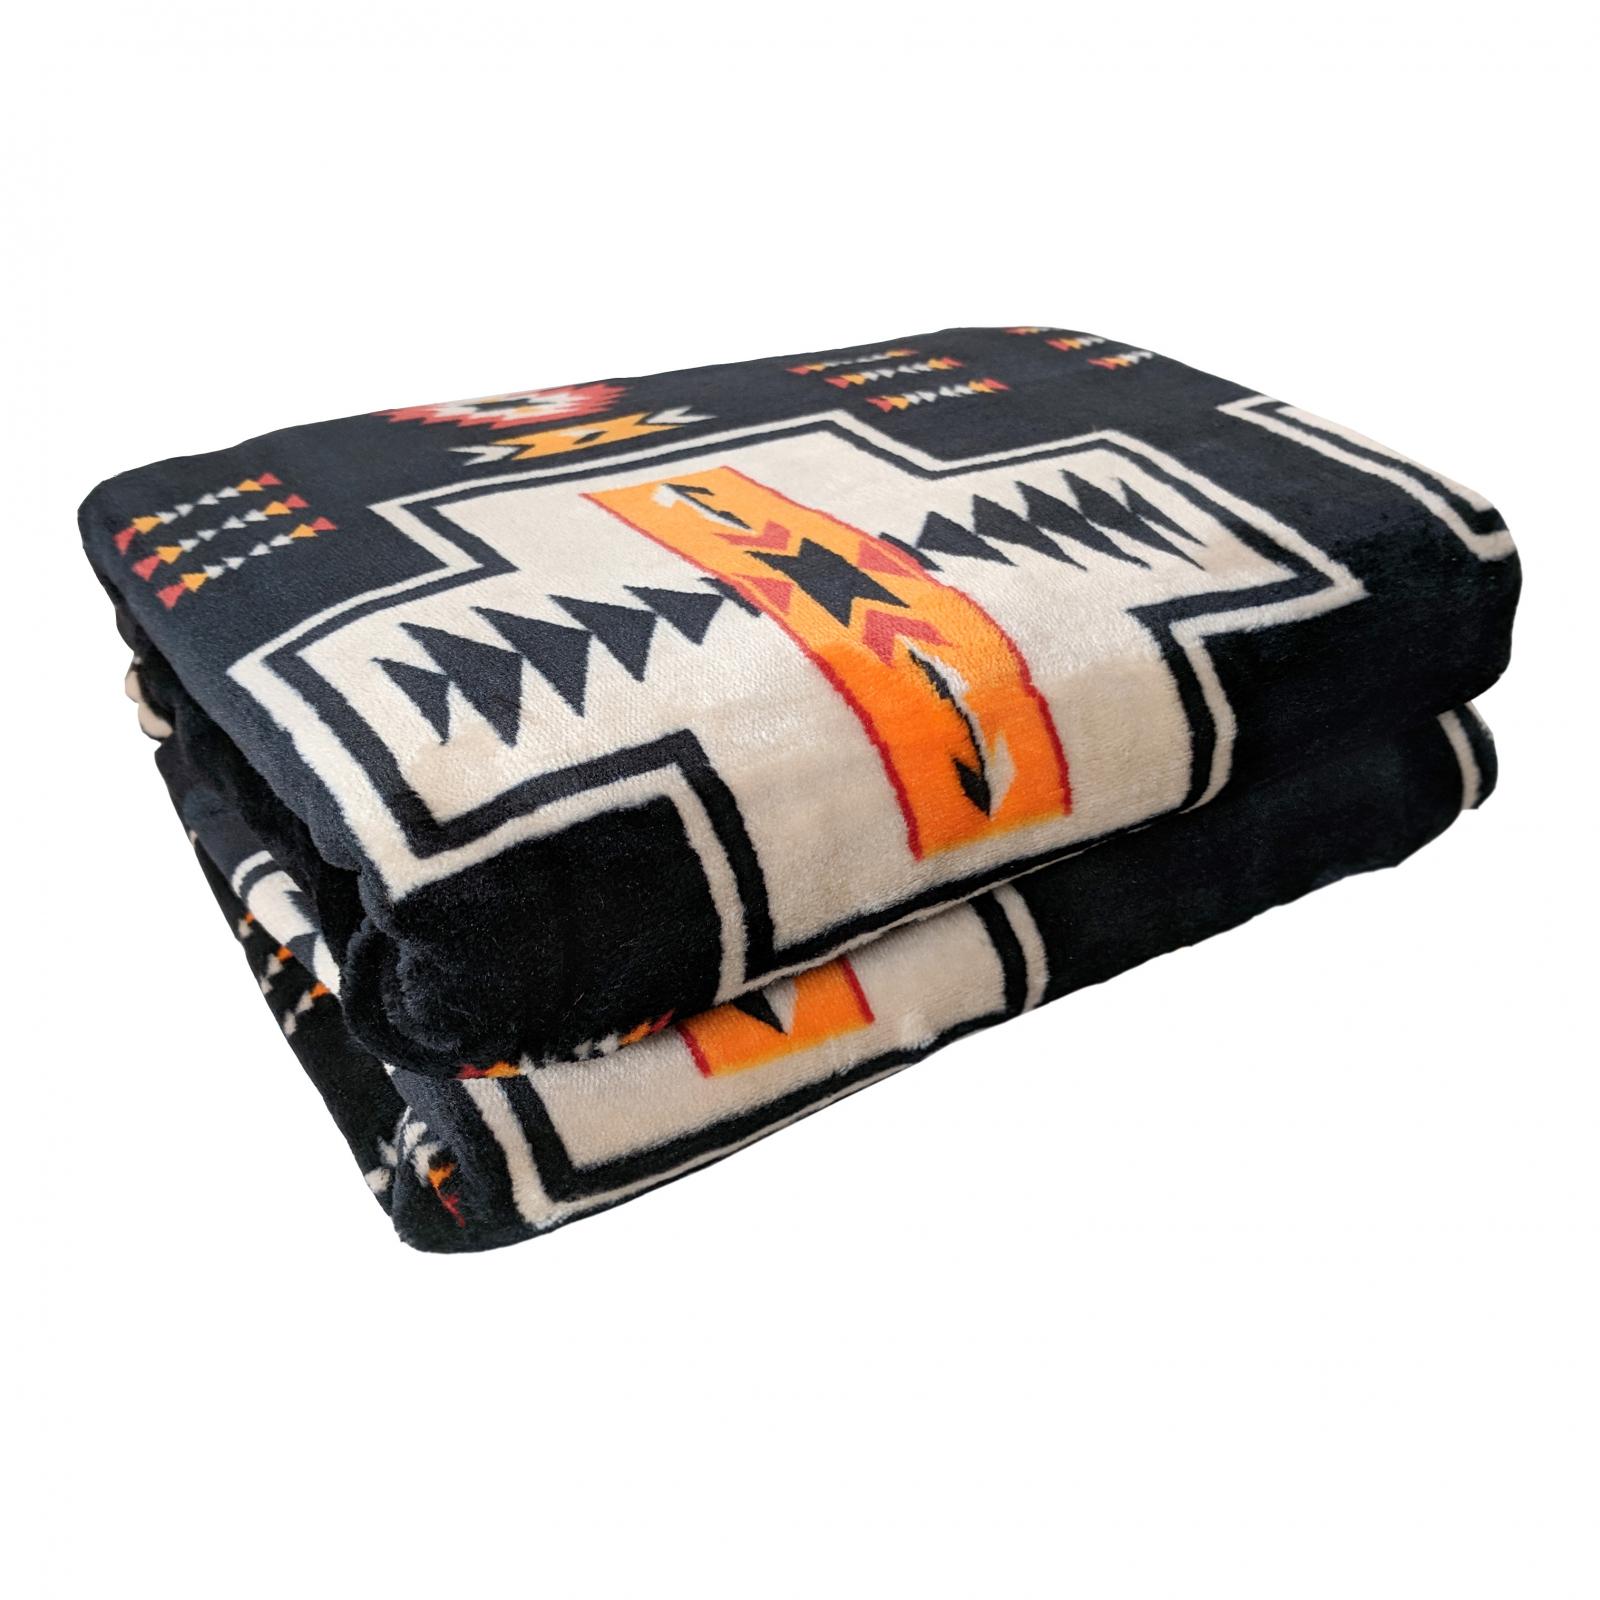 ASR Outdoor Southwest Blanket Reversible Throw - Black